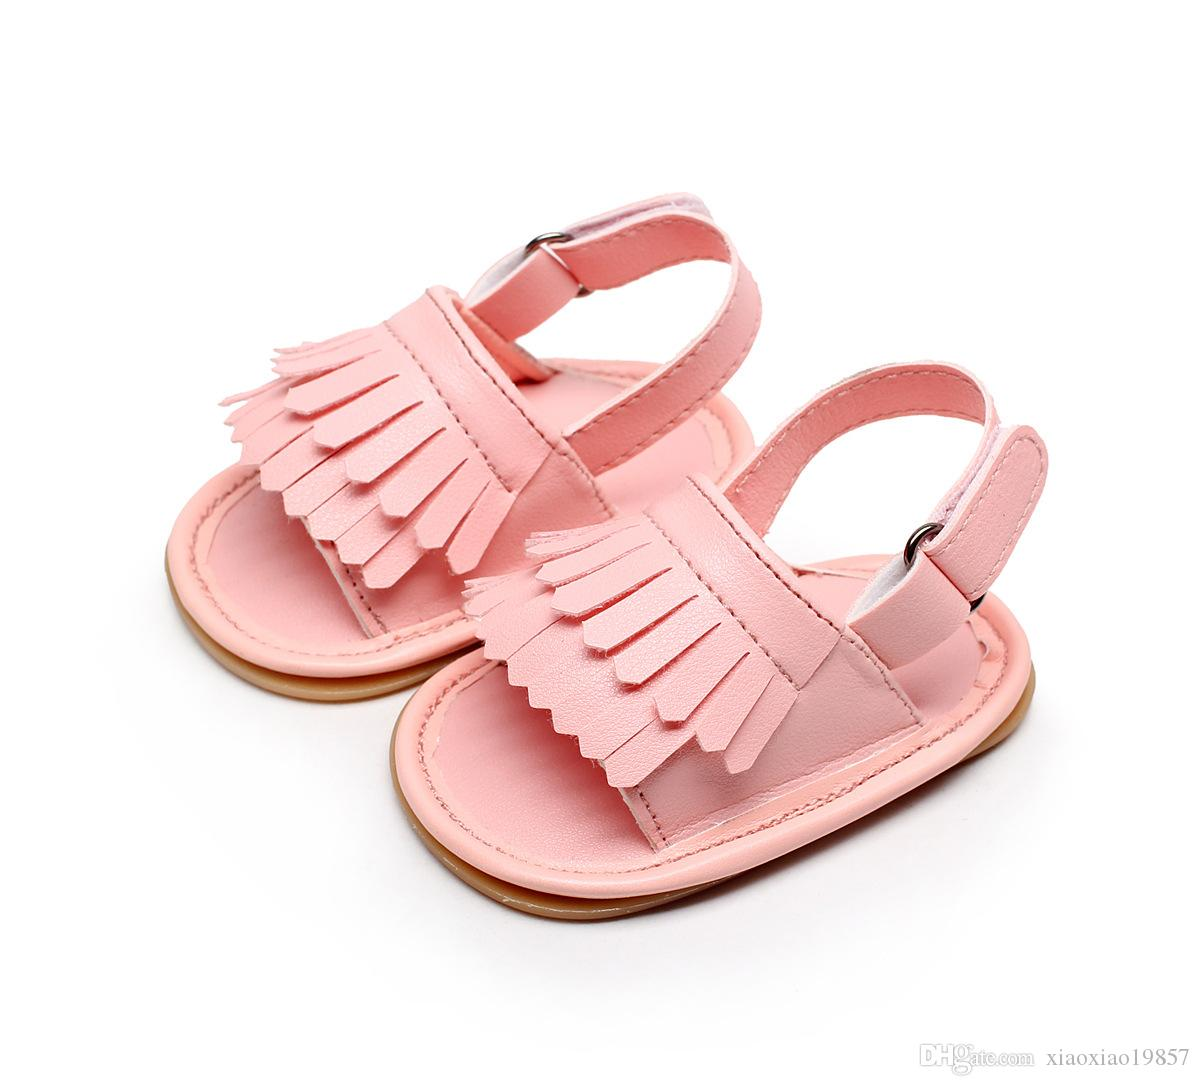 Baby Sandals Summer Newborns Leisure Baby Girls Sandals of Children PU Tassel Clogs Shoes Toddlers Infant Sandals